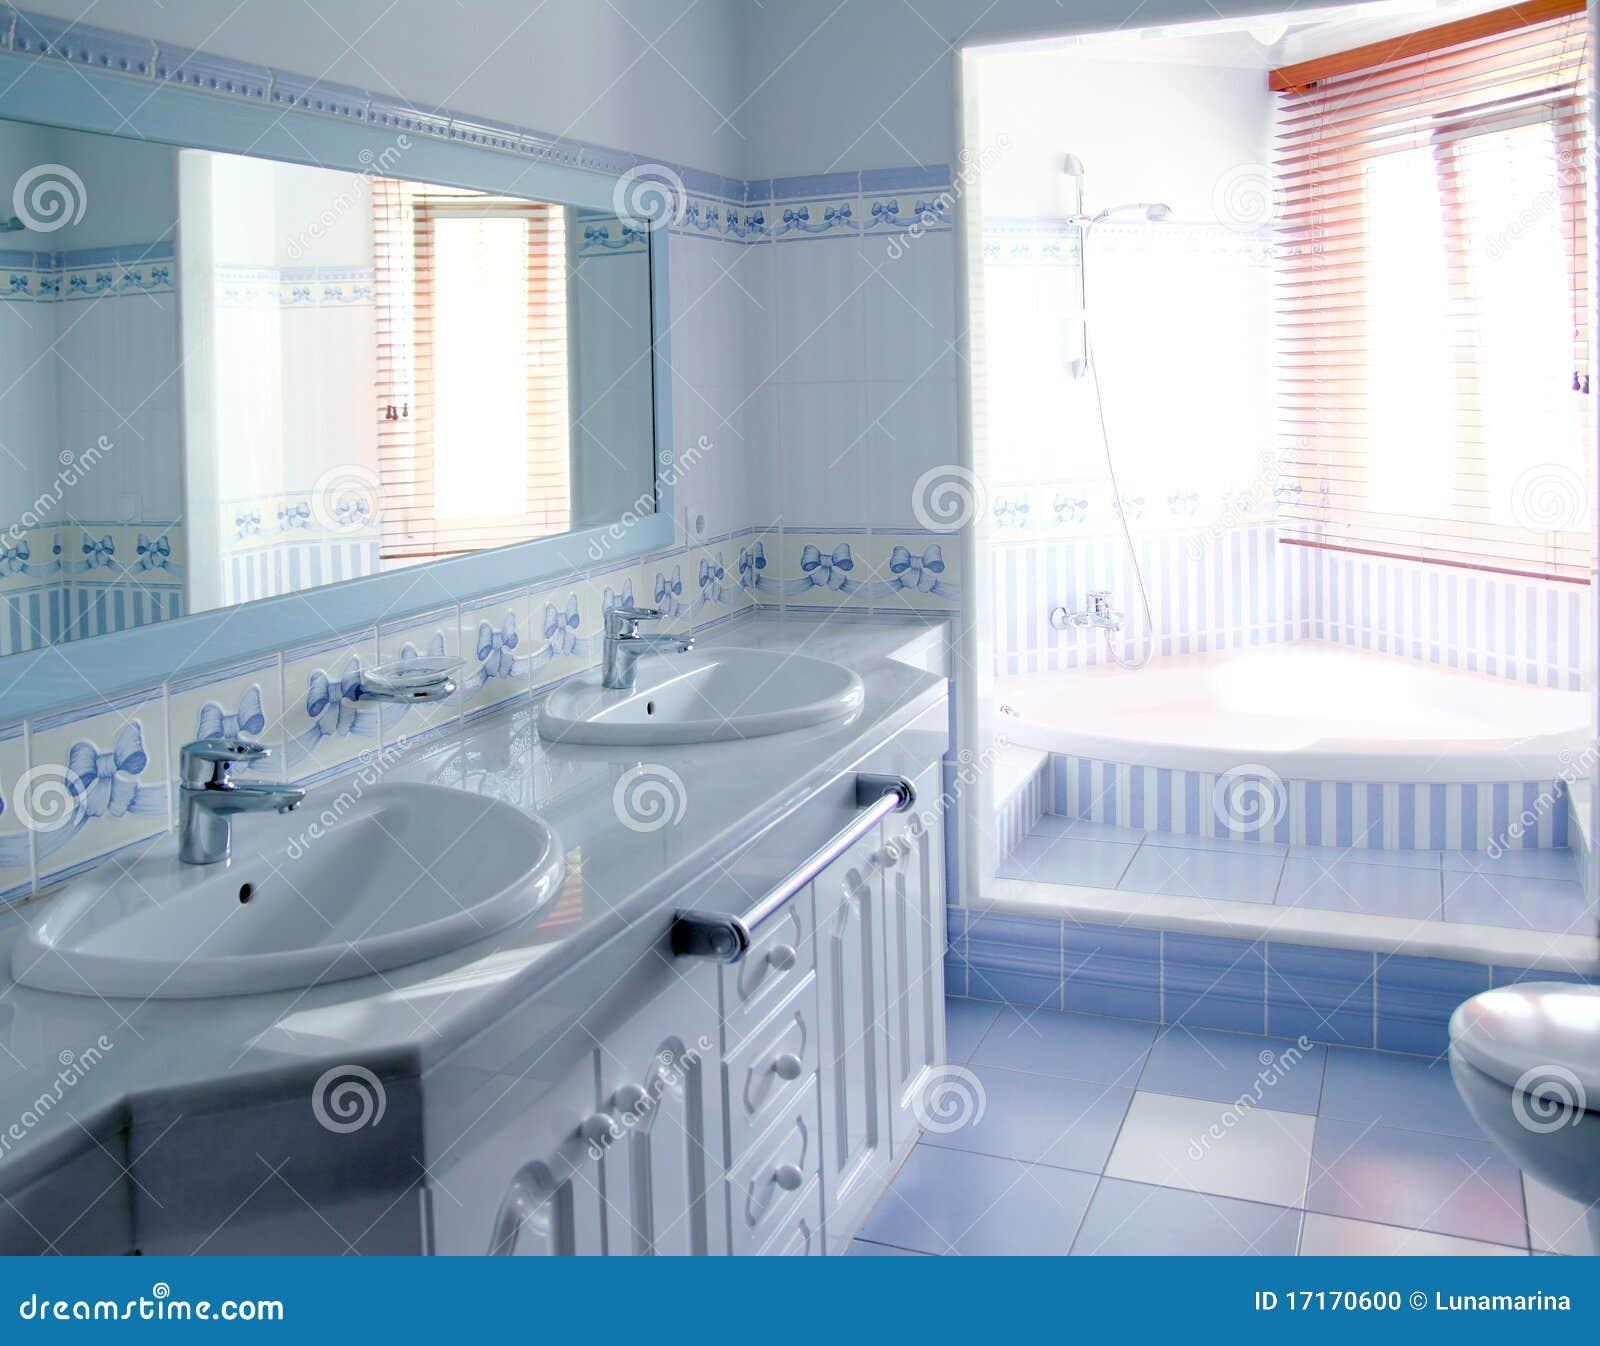 classic blue bathroom interior tiles decoration stock photo